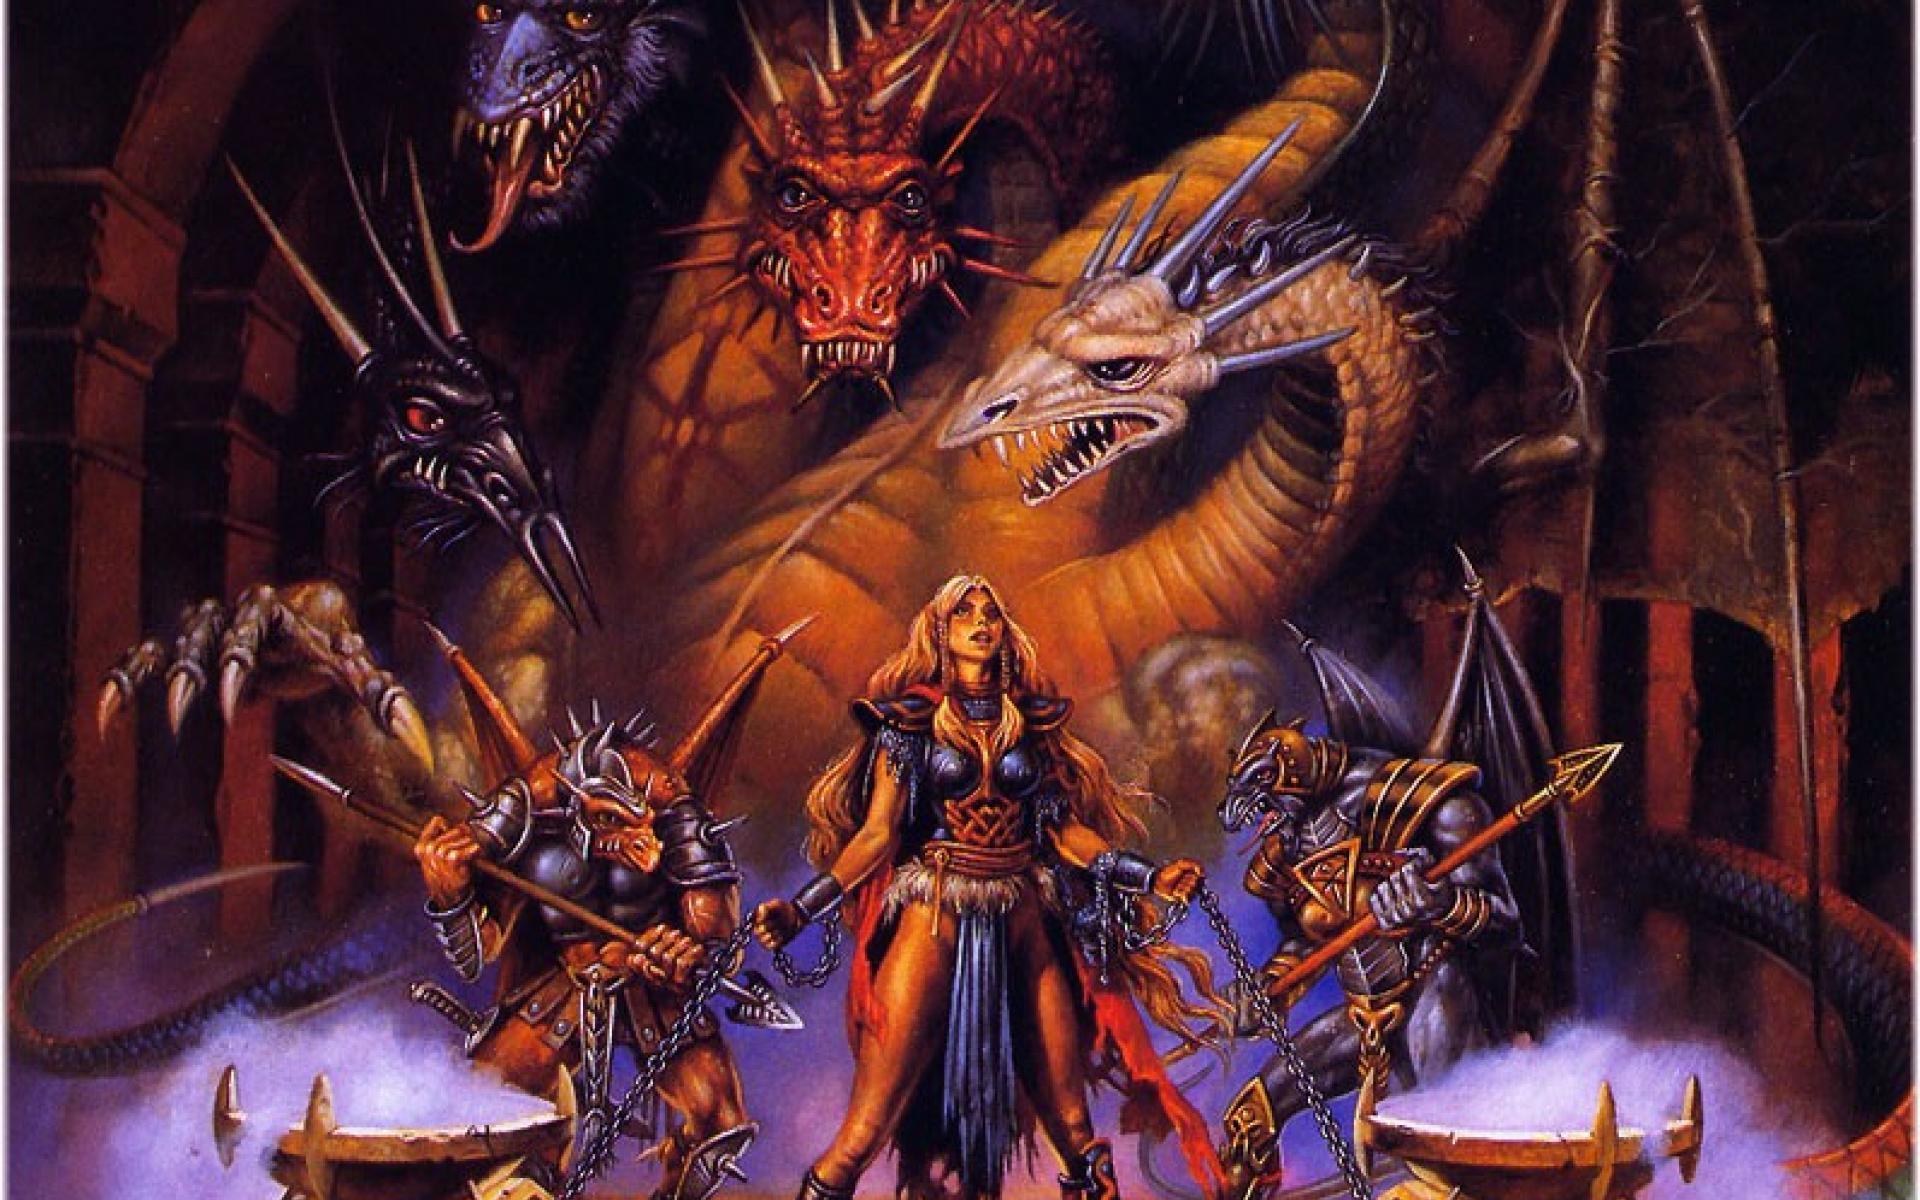 caldwell dragonlance laurana kanan HD Wallpaper   General 1186676 1920x1200